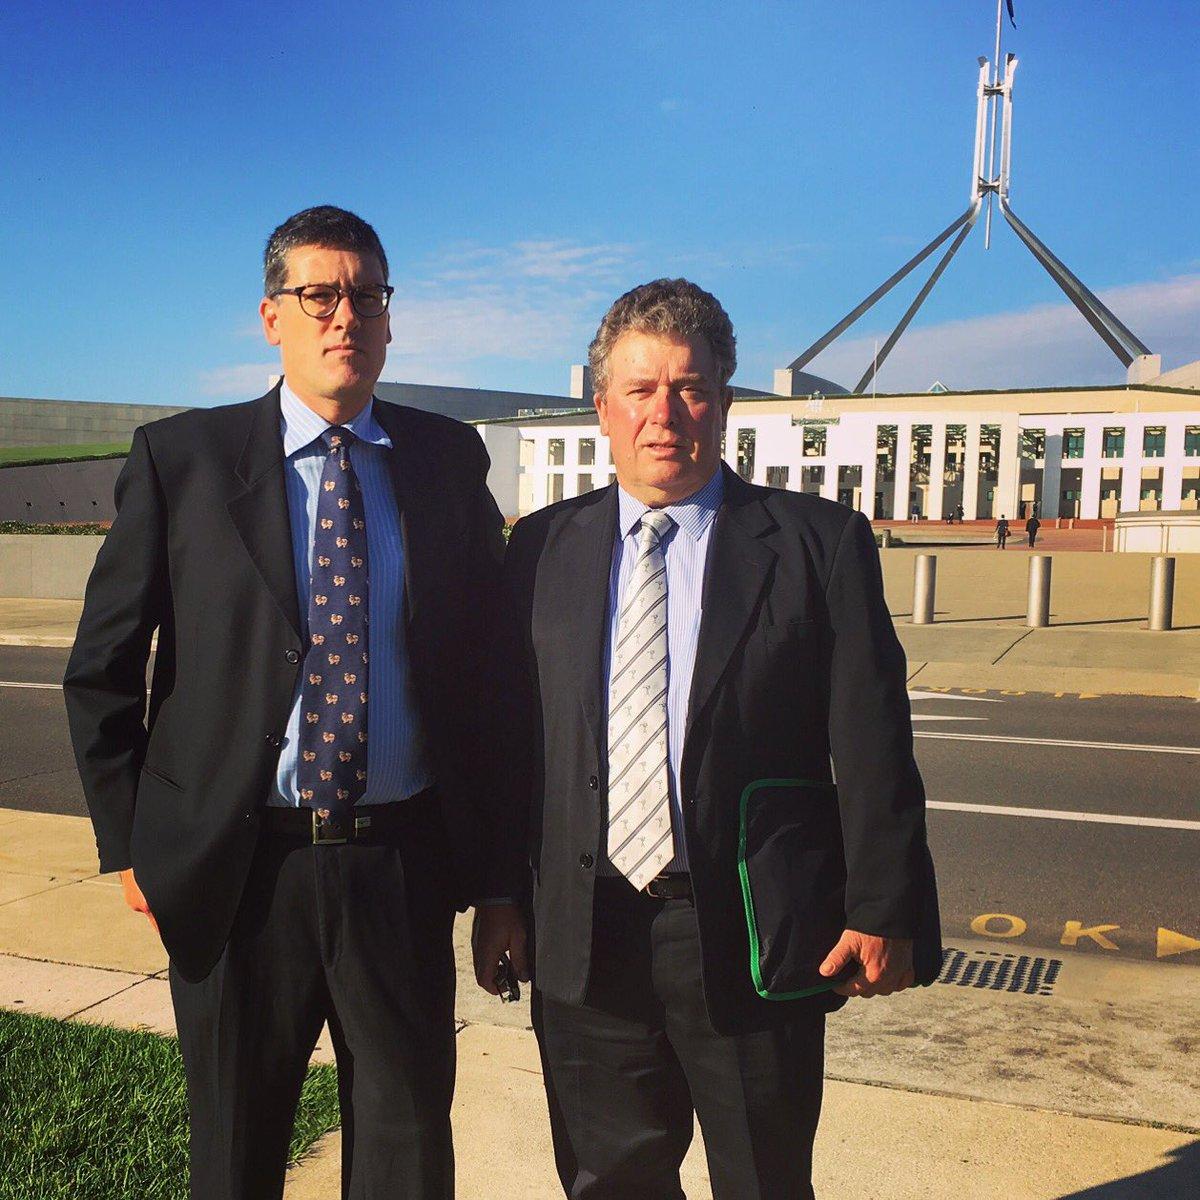 Brian & Eric Canberra 2.jpg